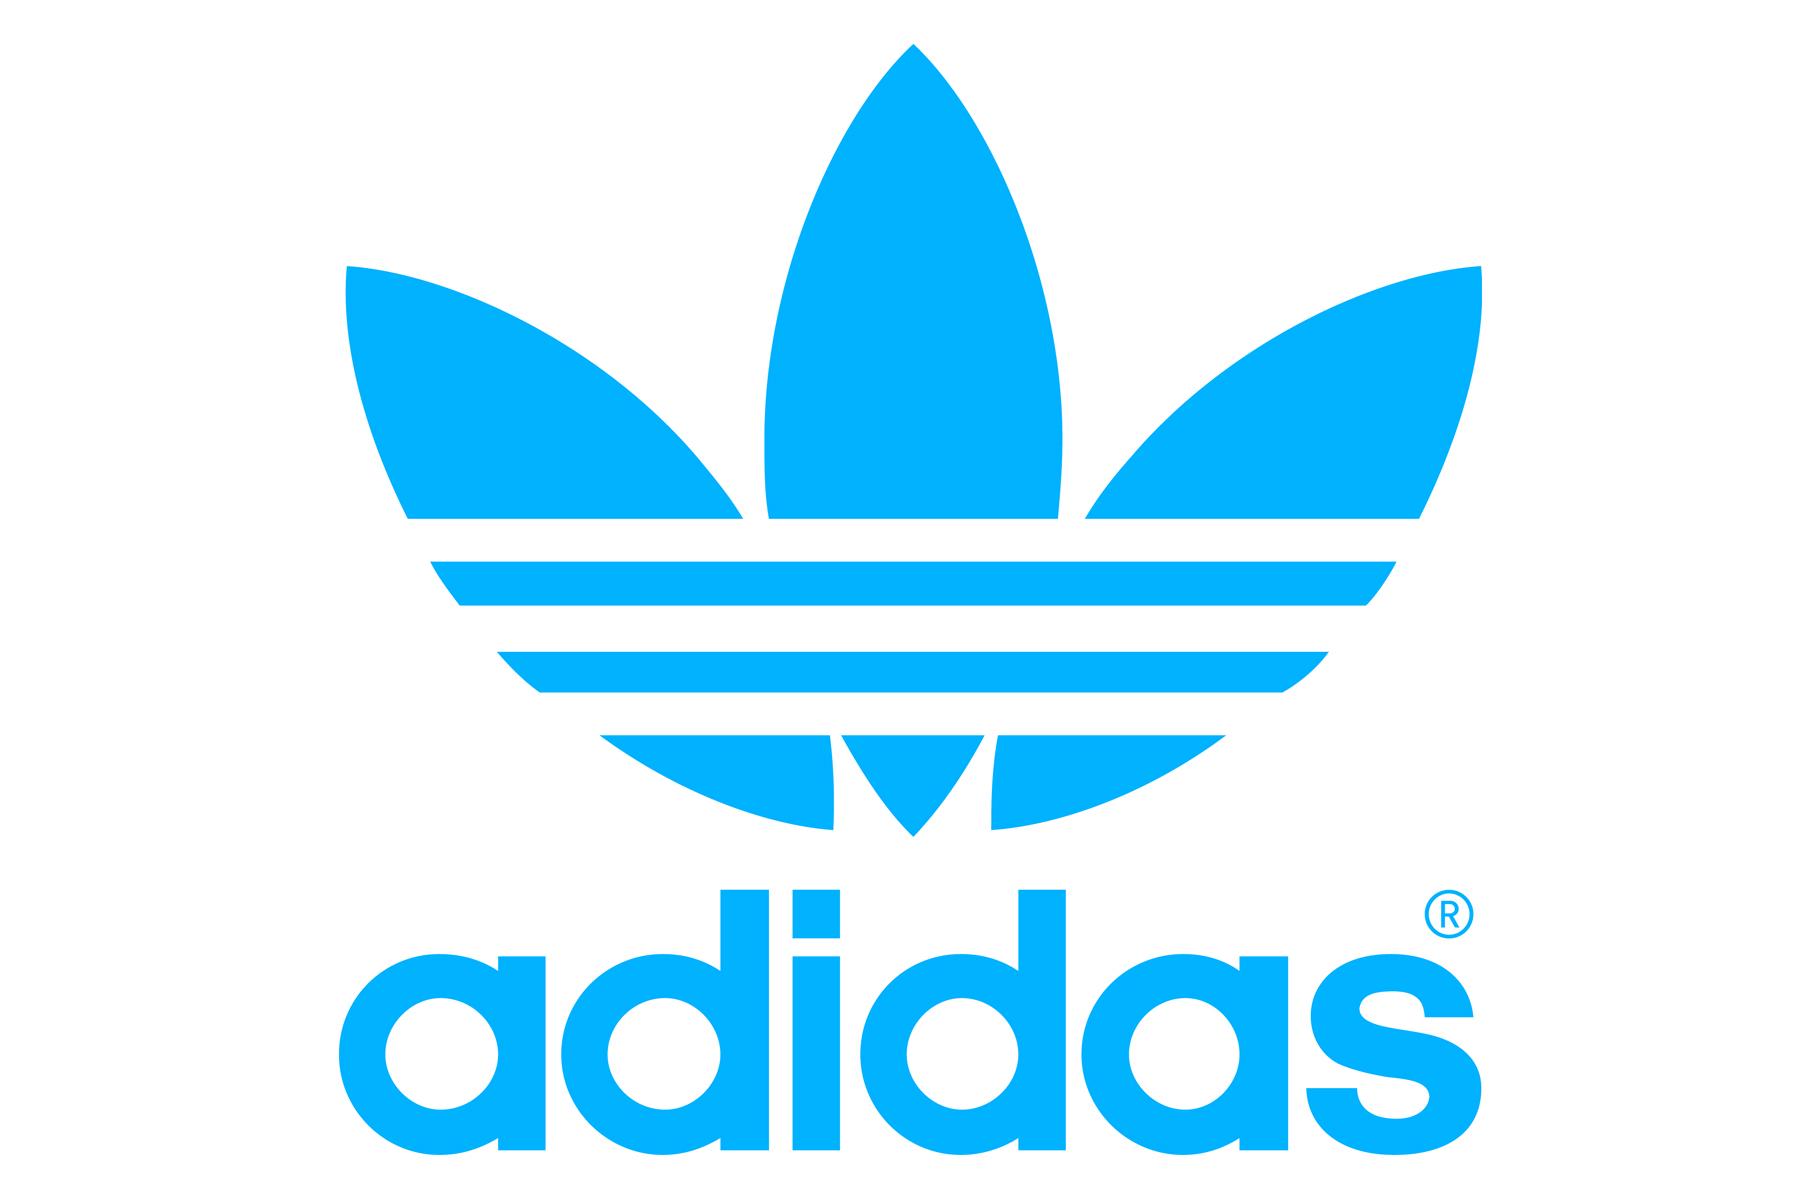 Free Adidas Logo Cliparts Download Free Clip Art Free Clip Art on Clipart Library